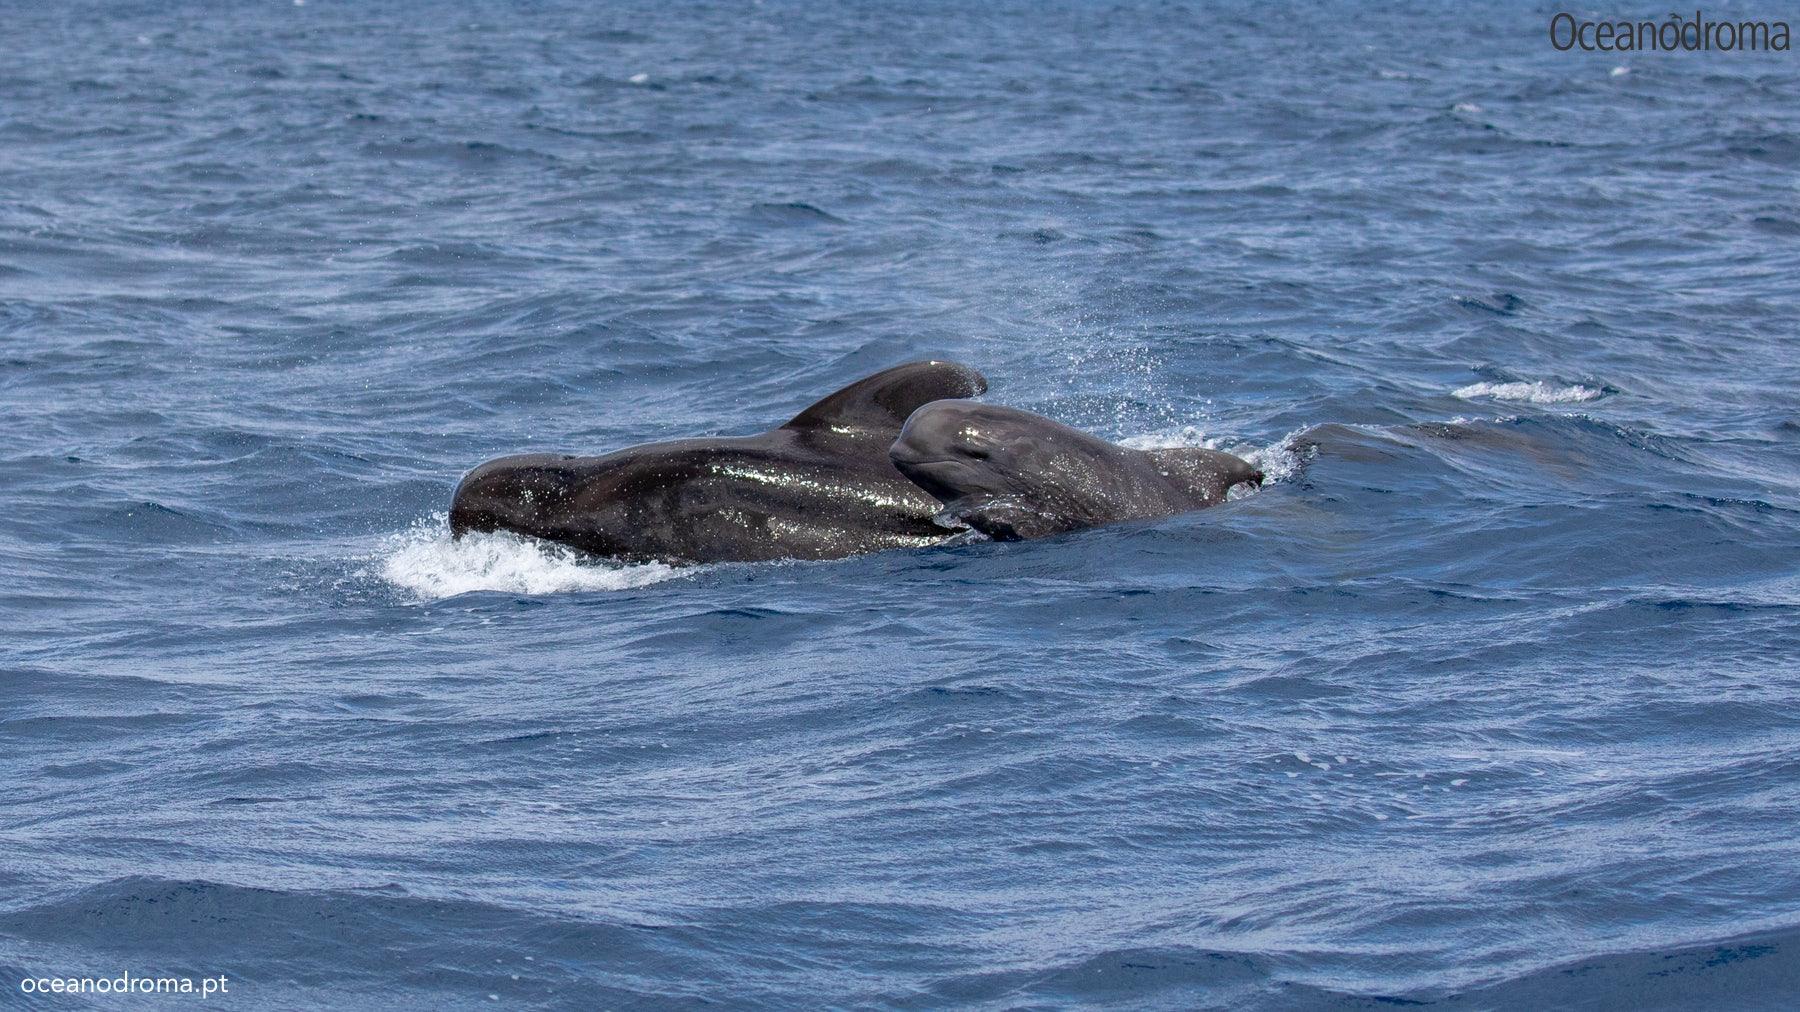 wbxno8-short-finned-pilot-whale-globicephala-macrorhynchus